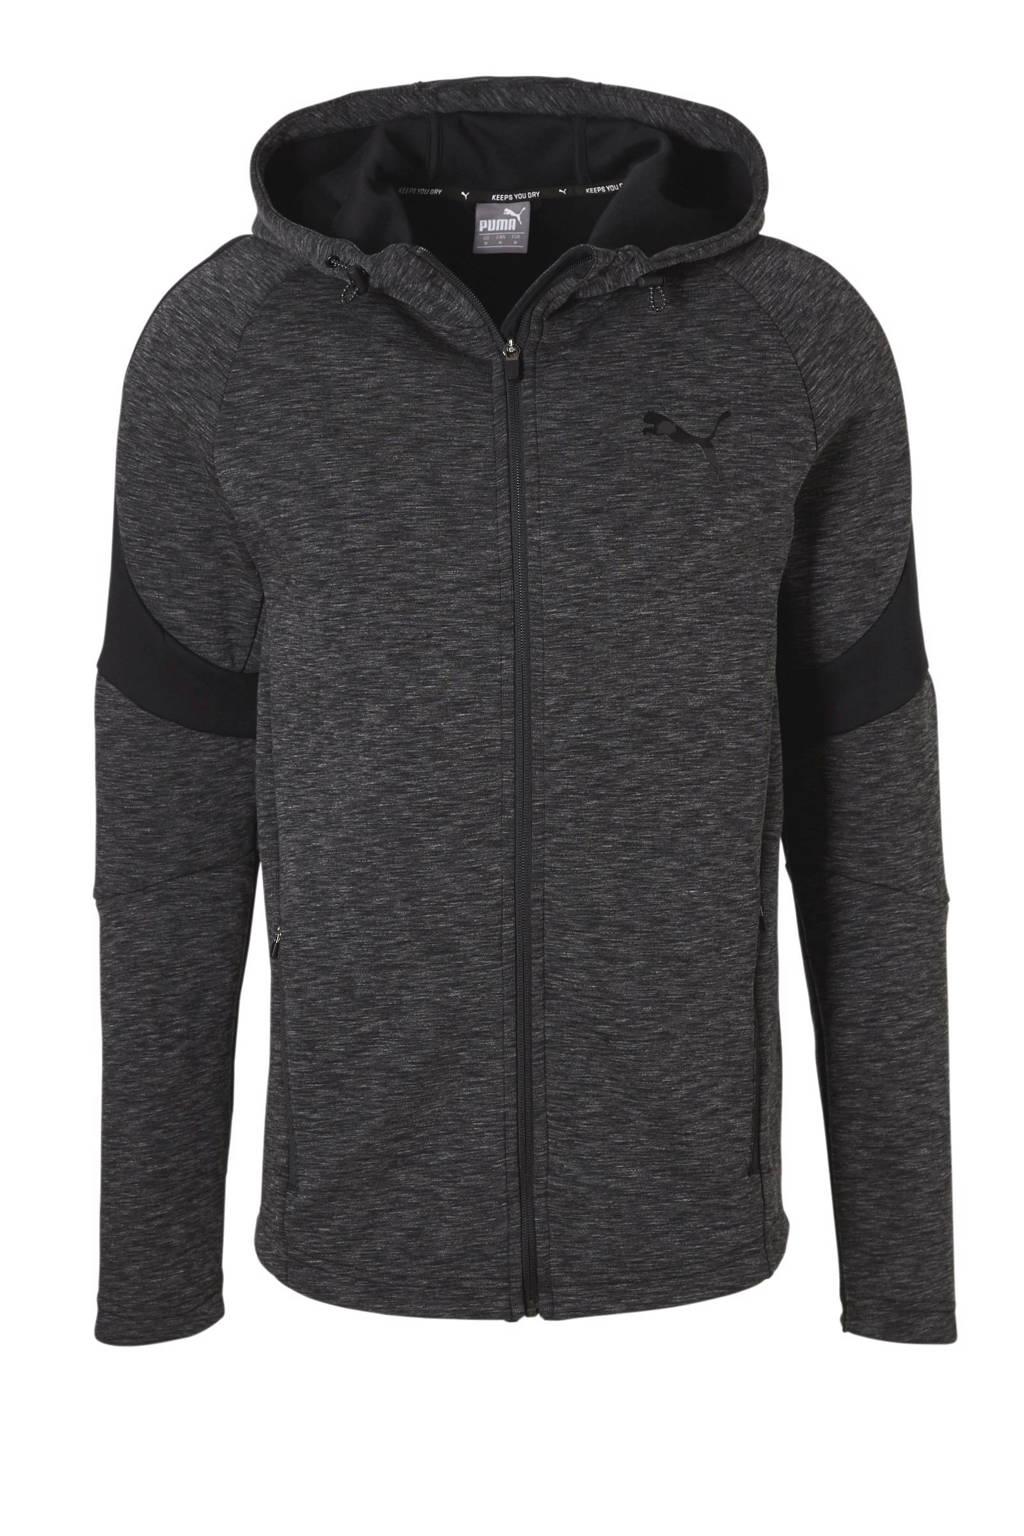 Puma heren zipped hoodie (sportvest) -74% @ Wehkamp